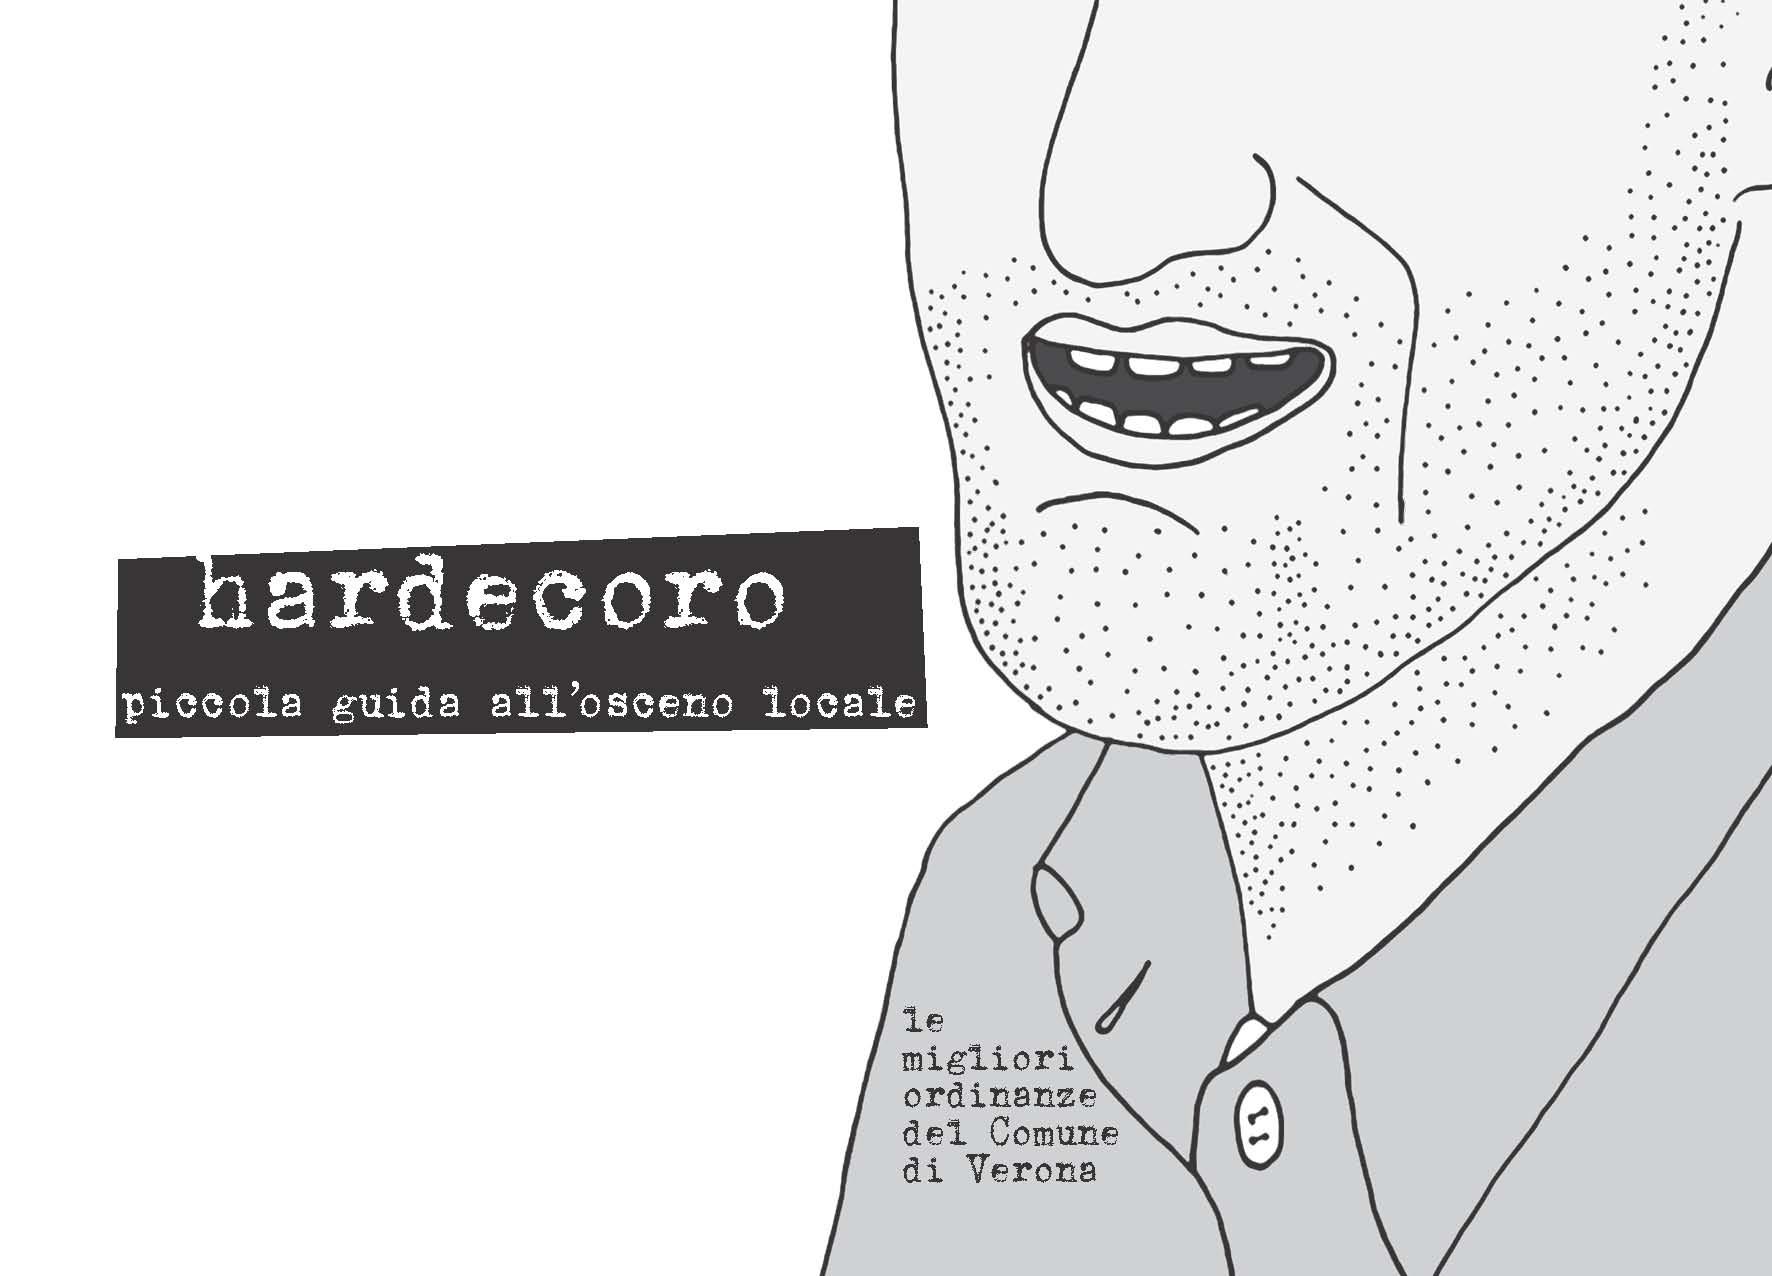 http://veronainforme.noblogs.org/gallery/665/HARDECORO.jpg